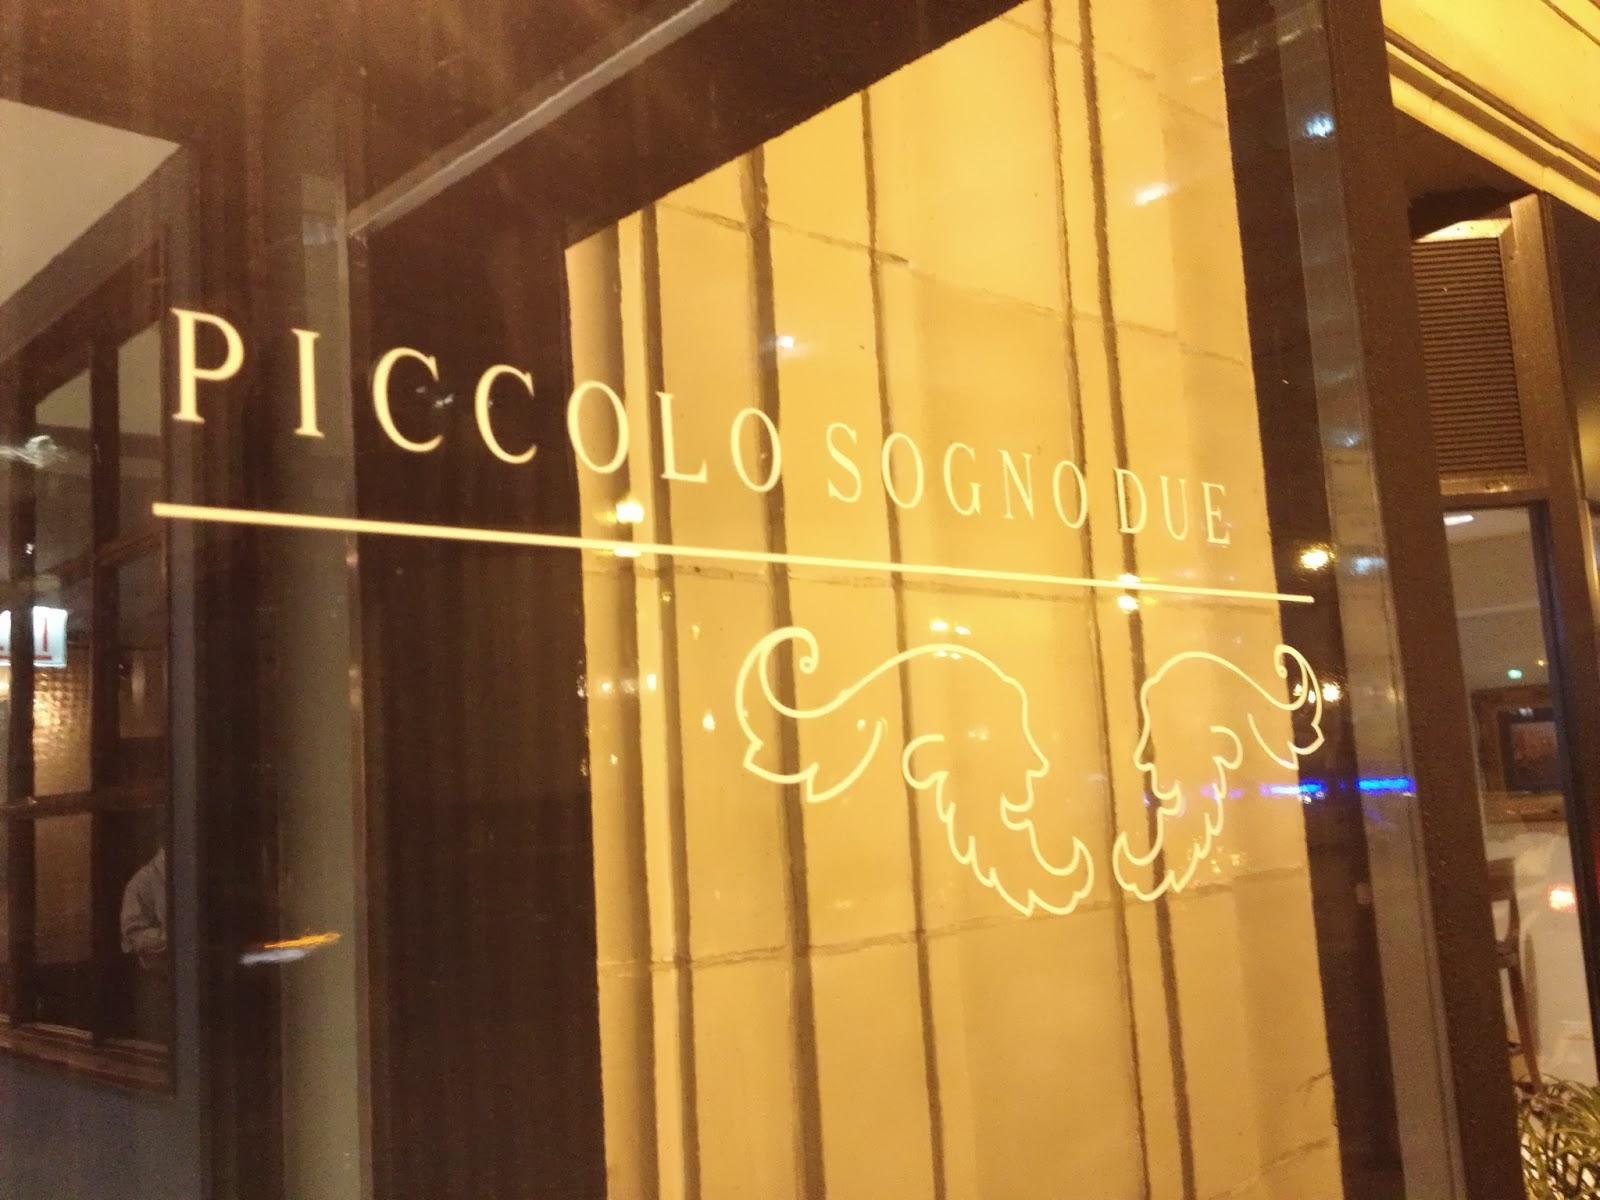 Chicago Restaurant Review Piccolo Sogno Due Fancy Italian